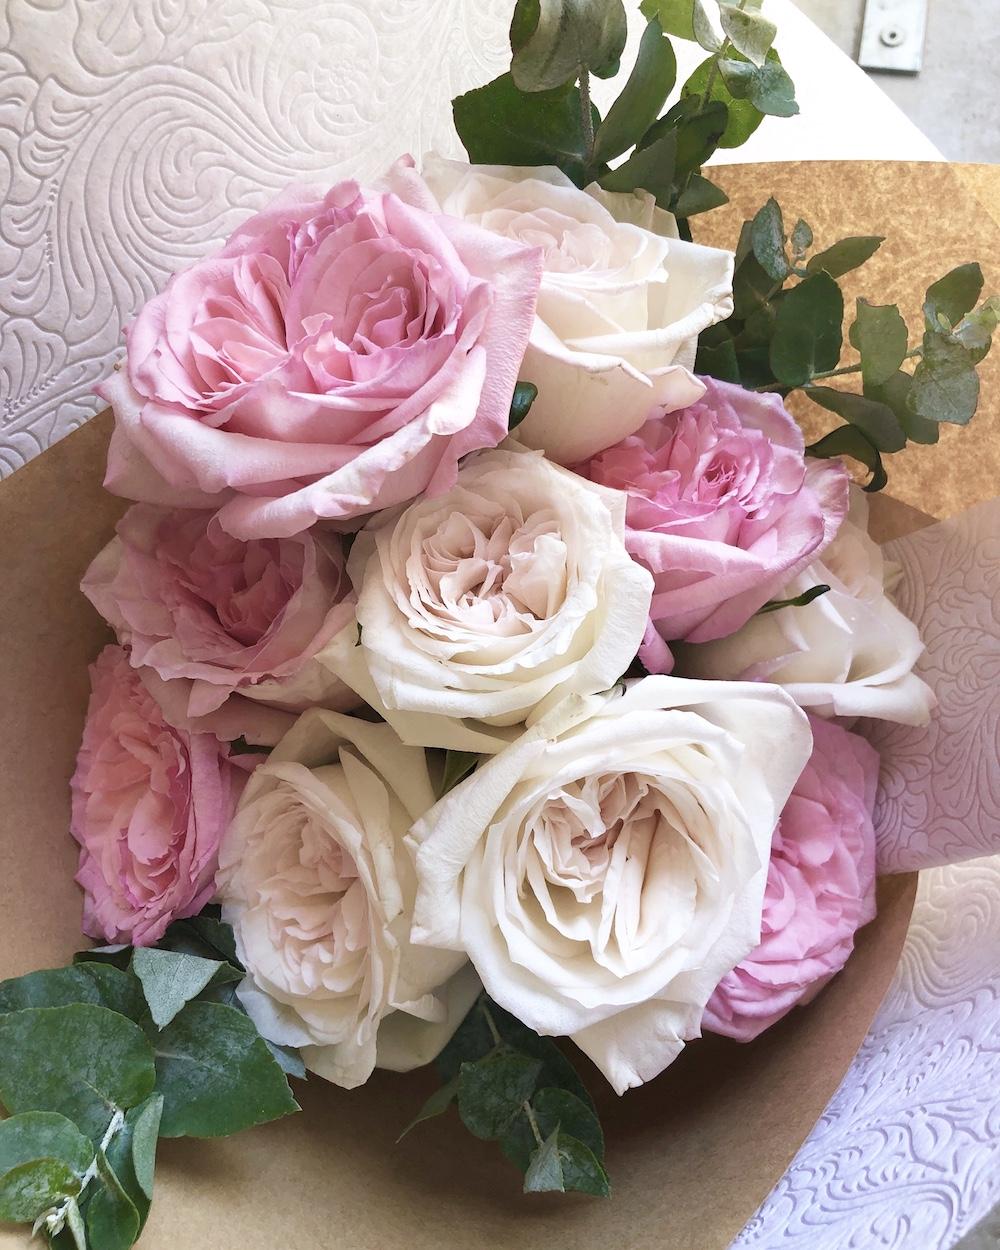 Fresh Flowers Bouquet Online Maitland - RosyPosyCo